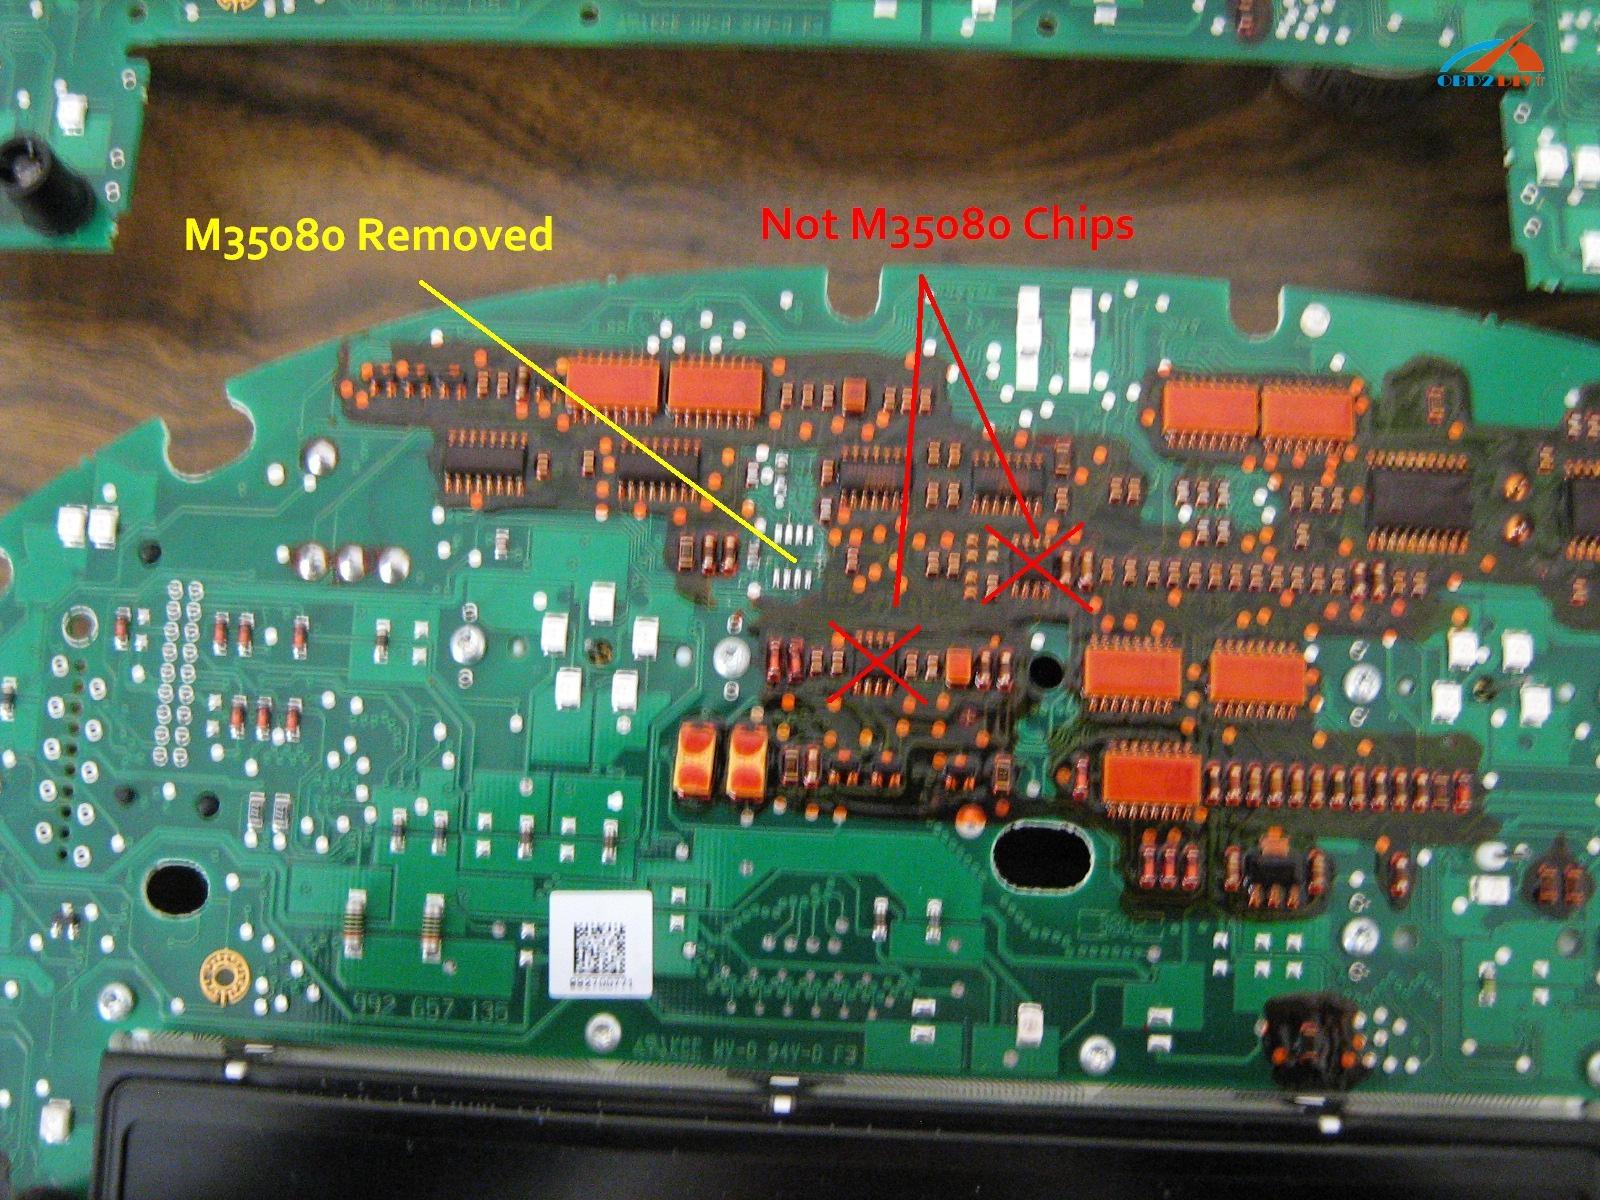 vvdi-prog-bmw-m35080-chip-location